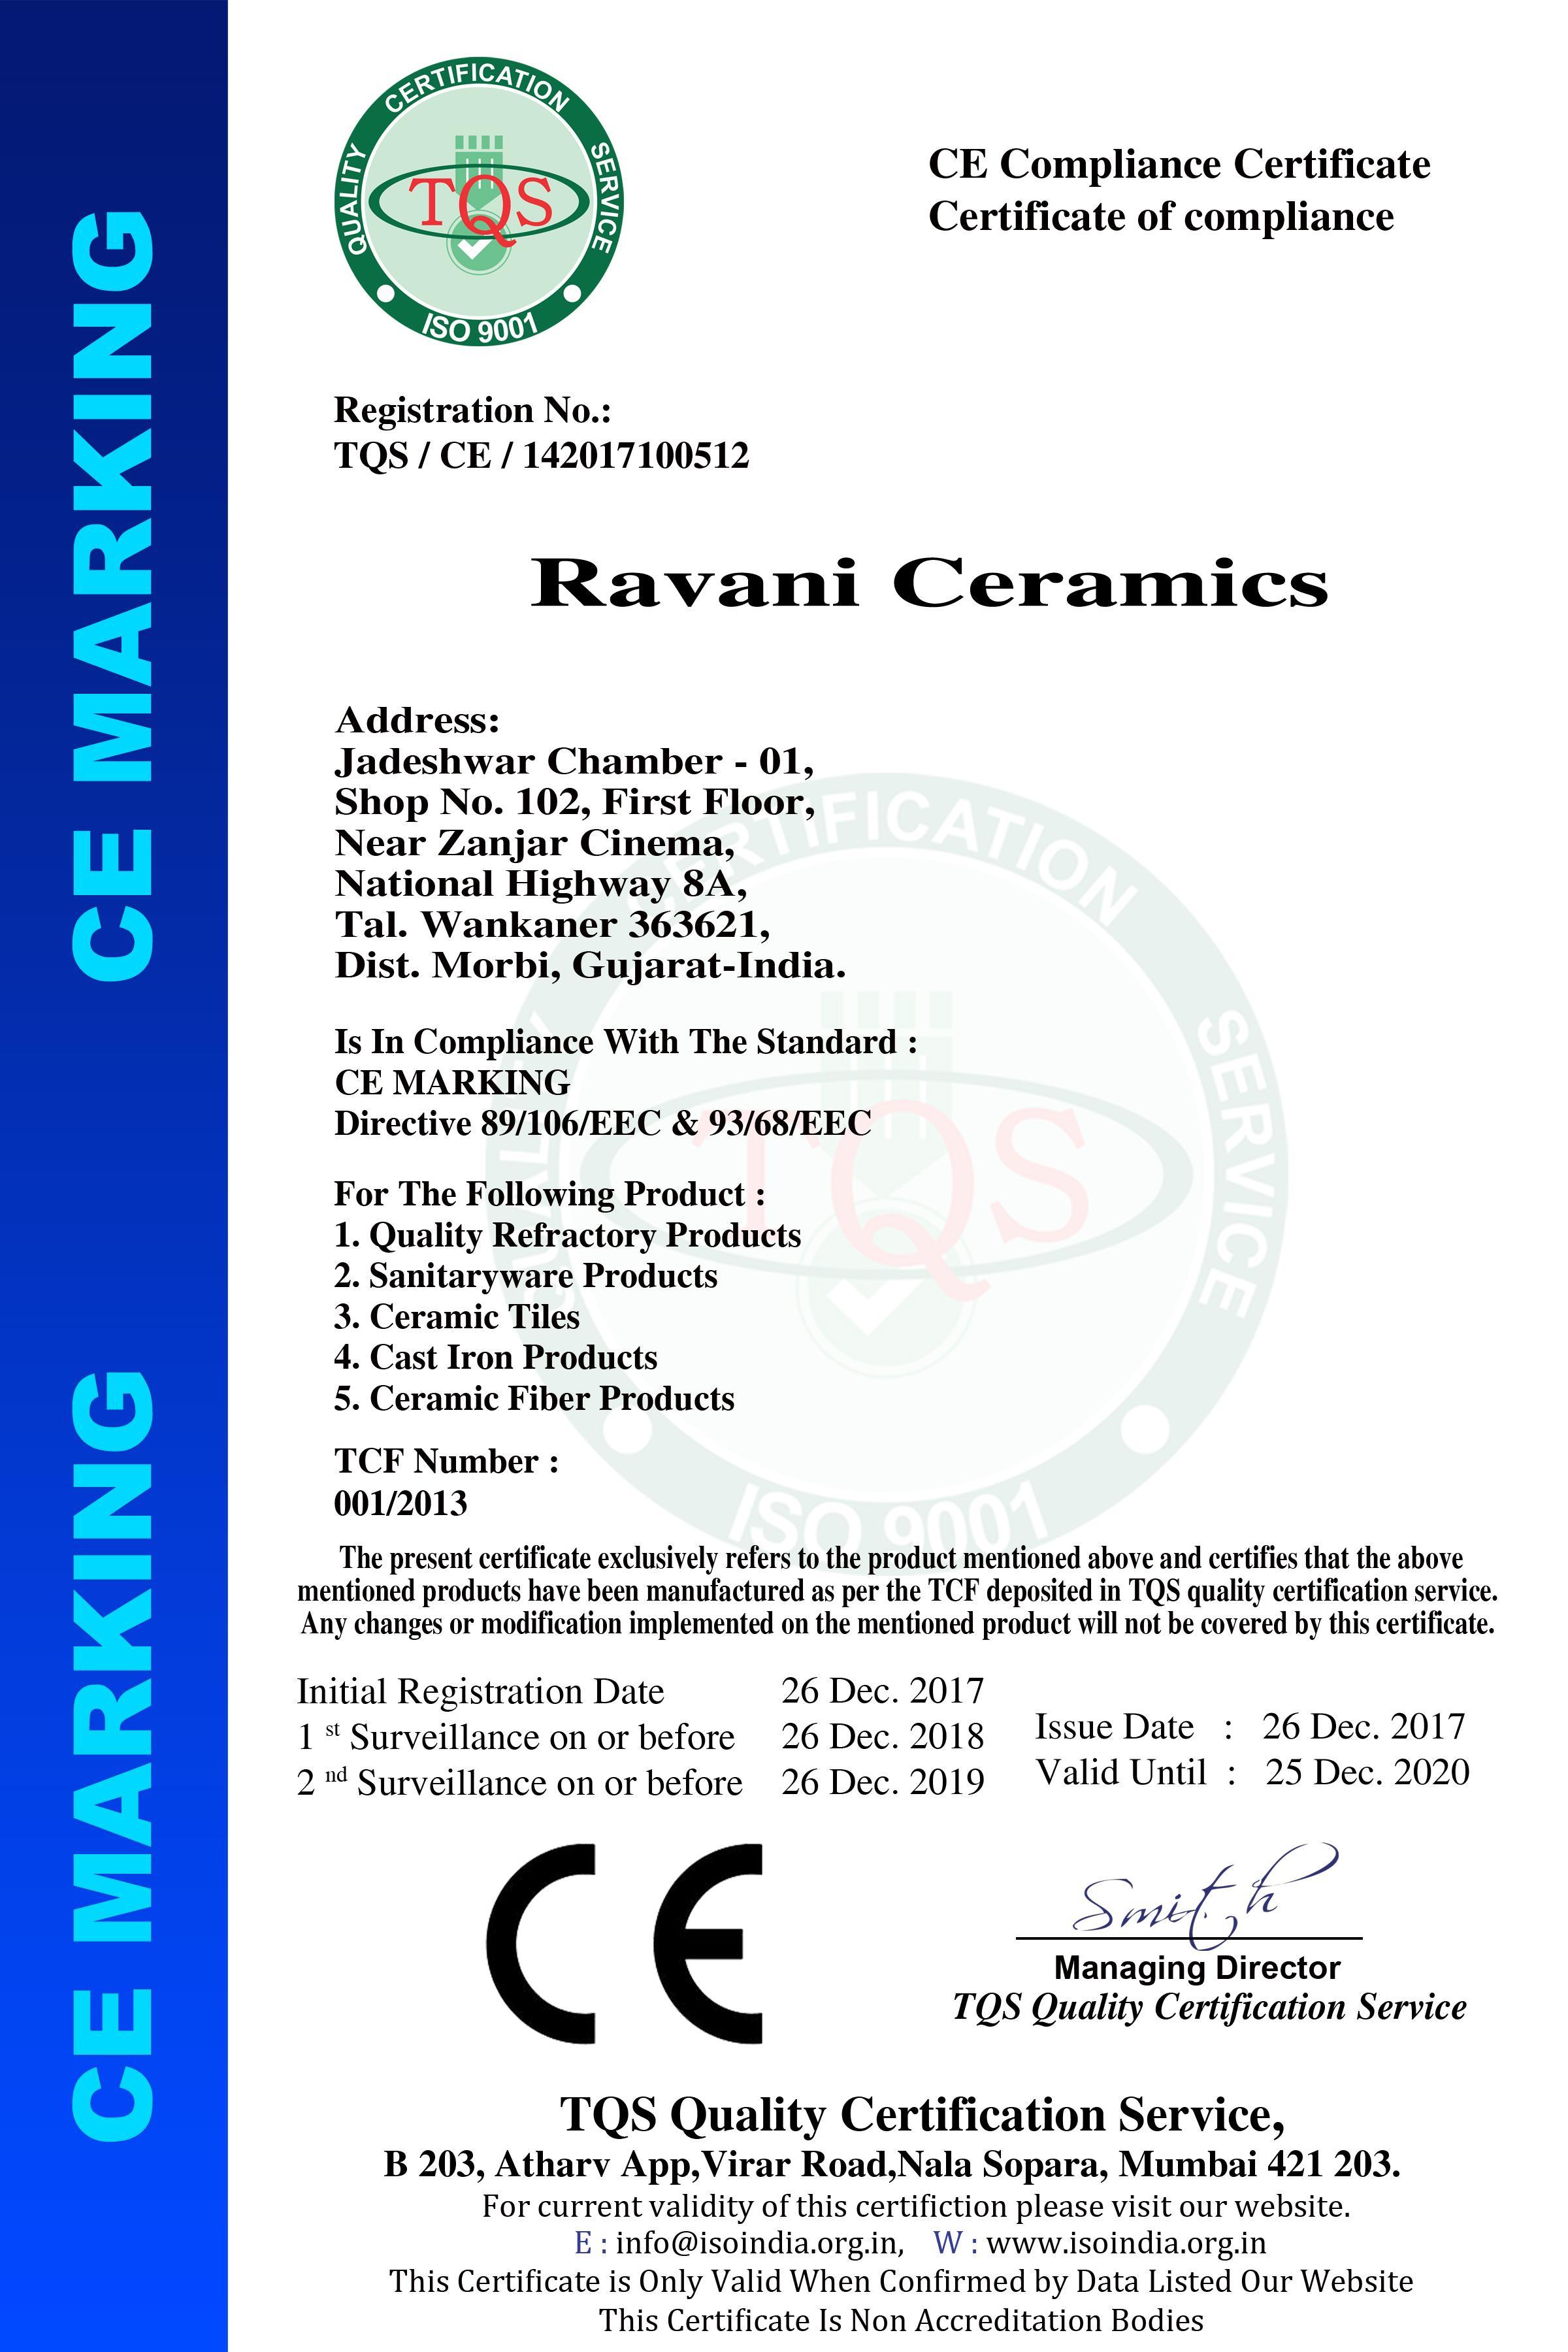 Ravani_Ceramics_CE